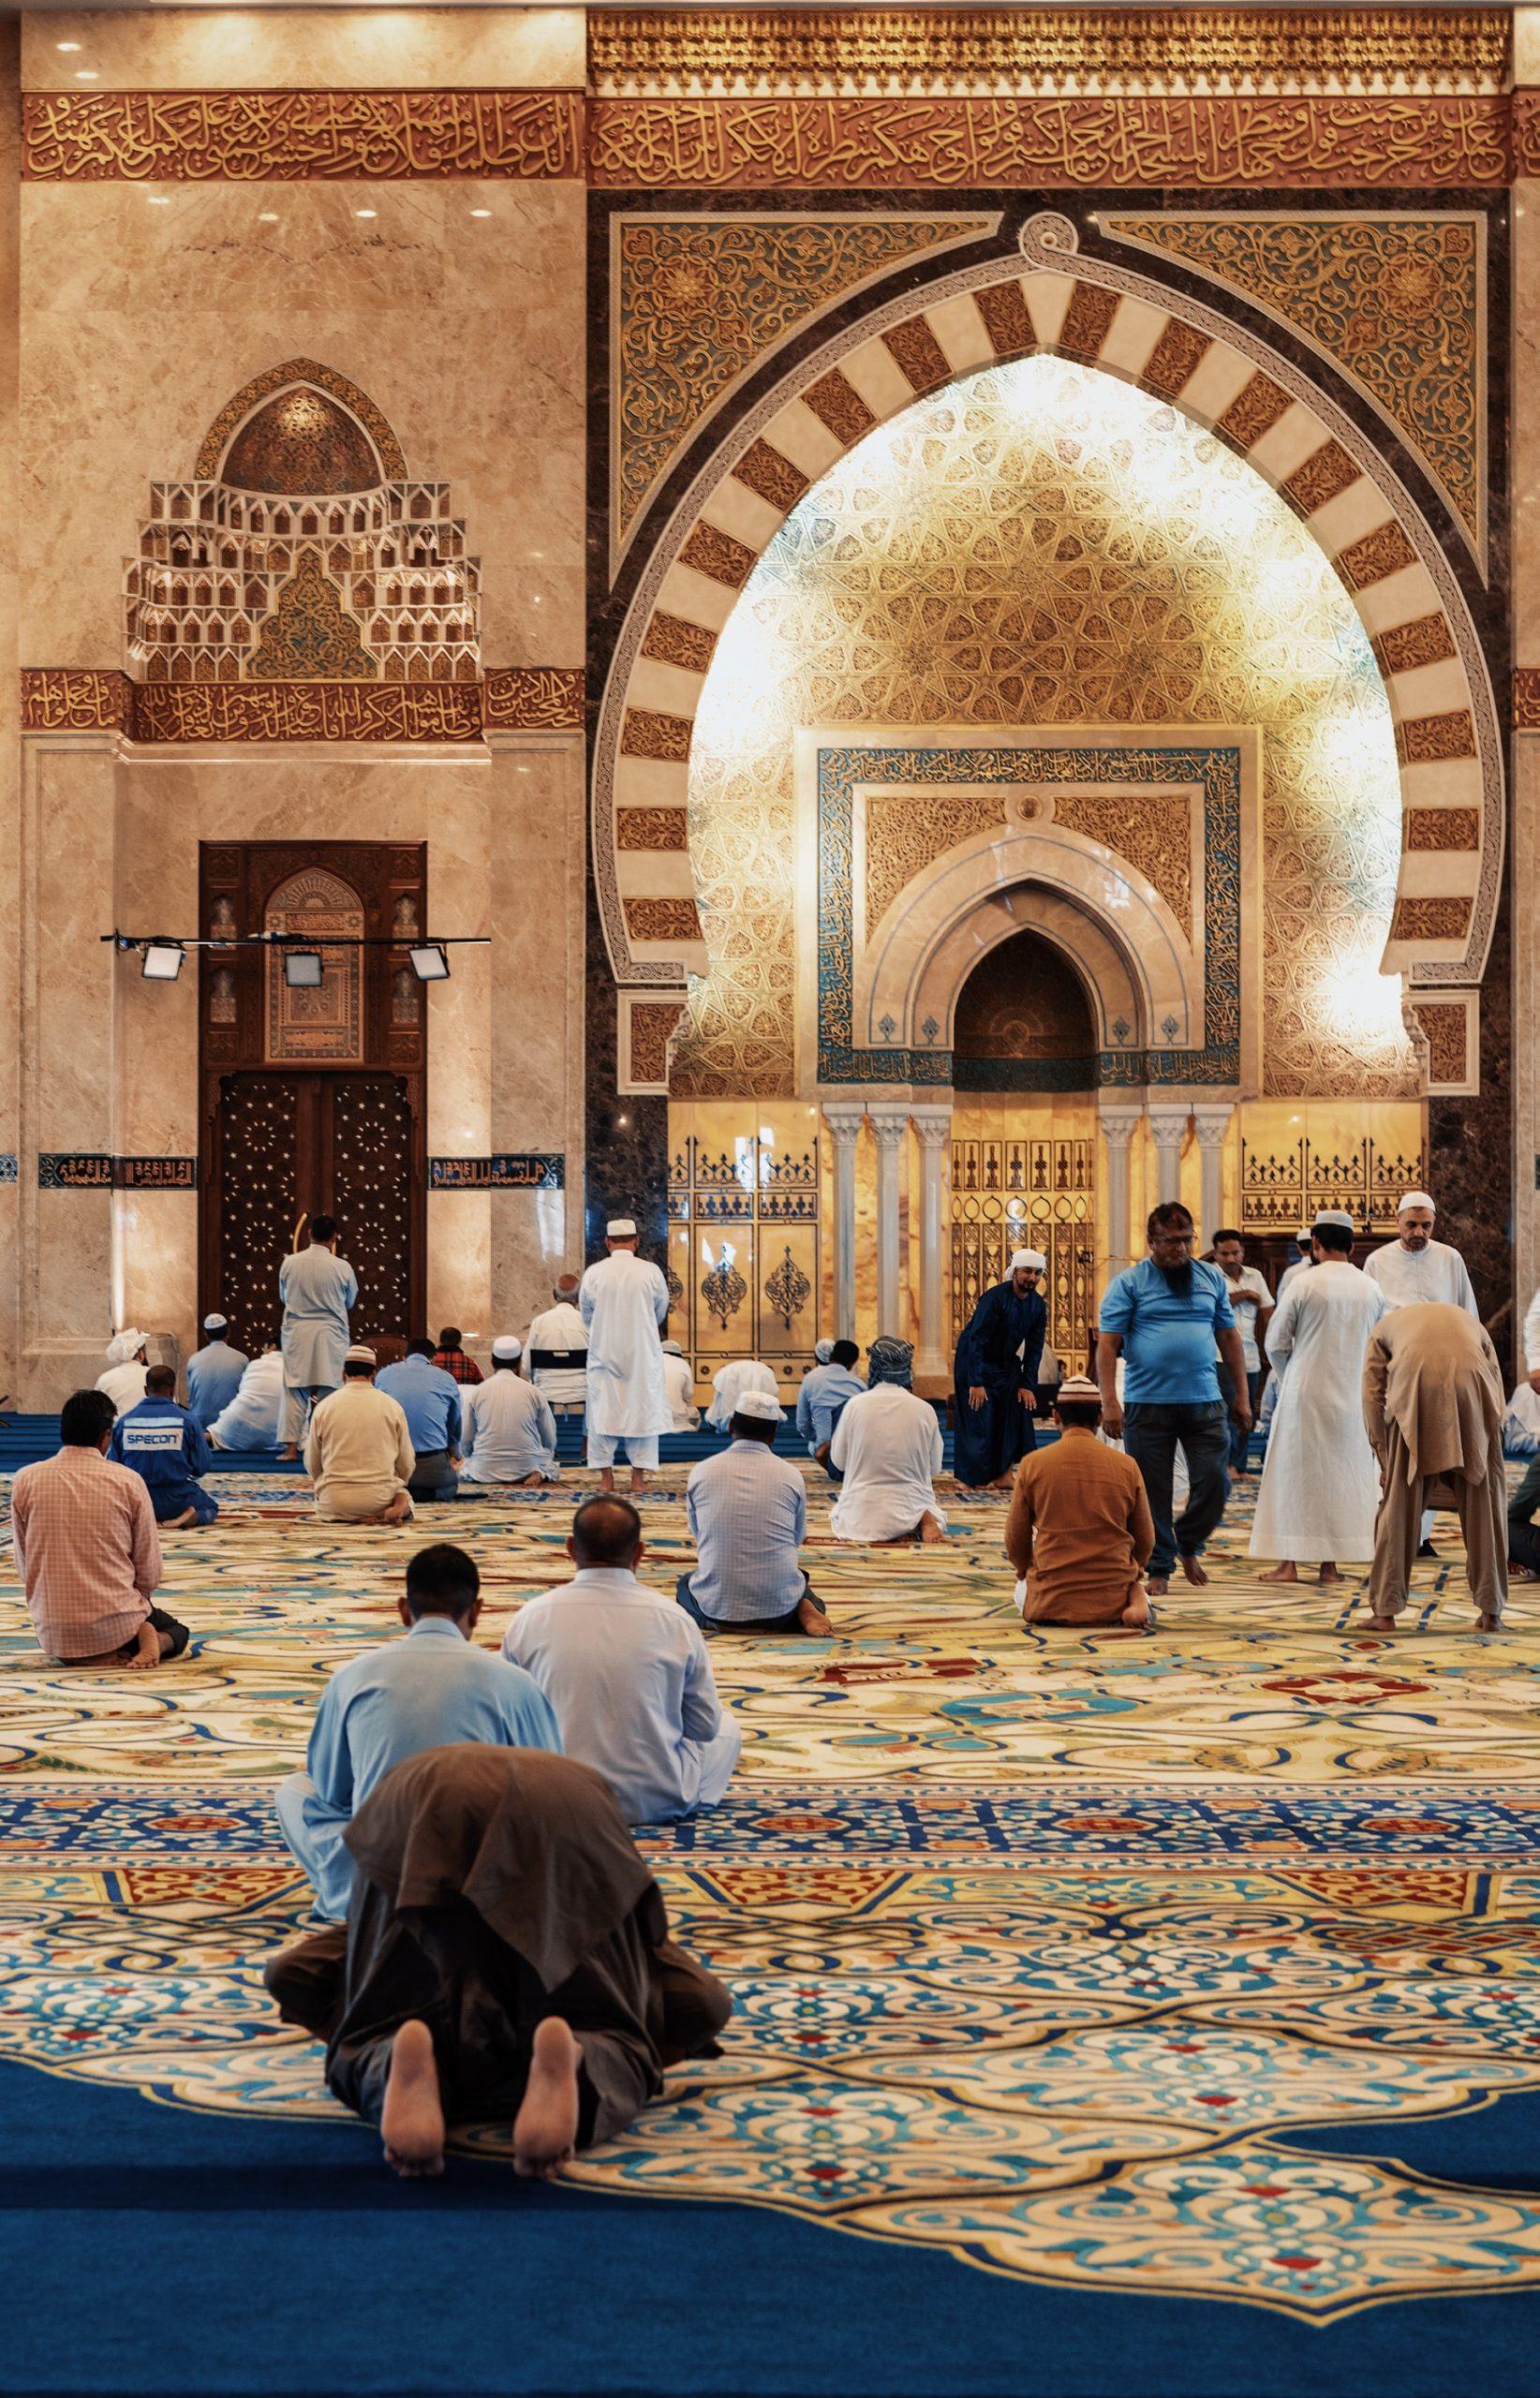 Muslime konvertieren zum christentum